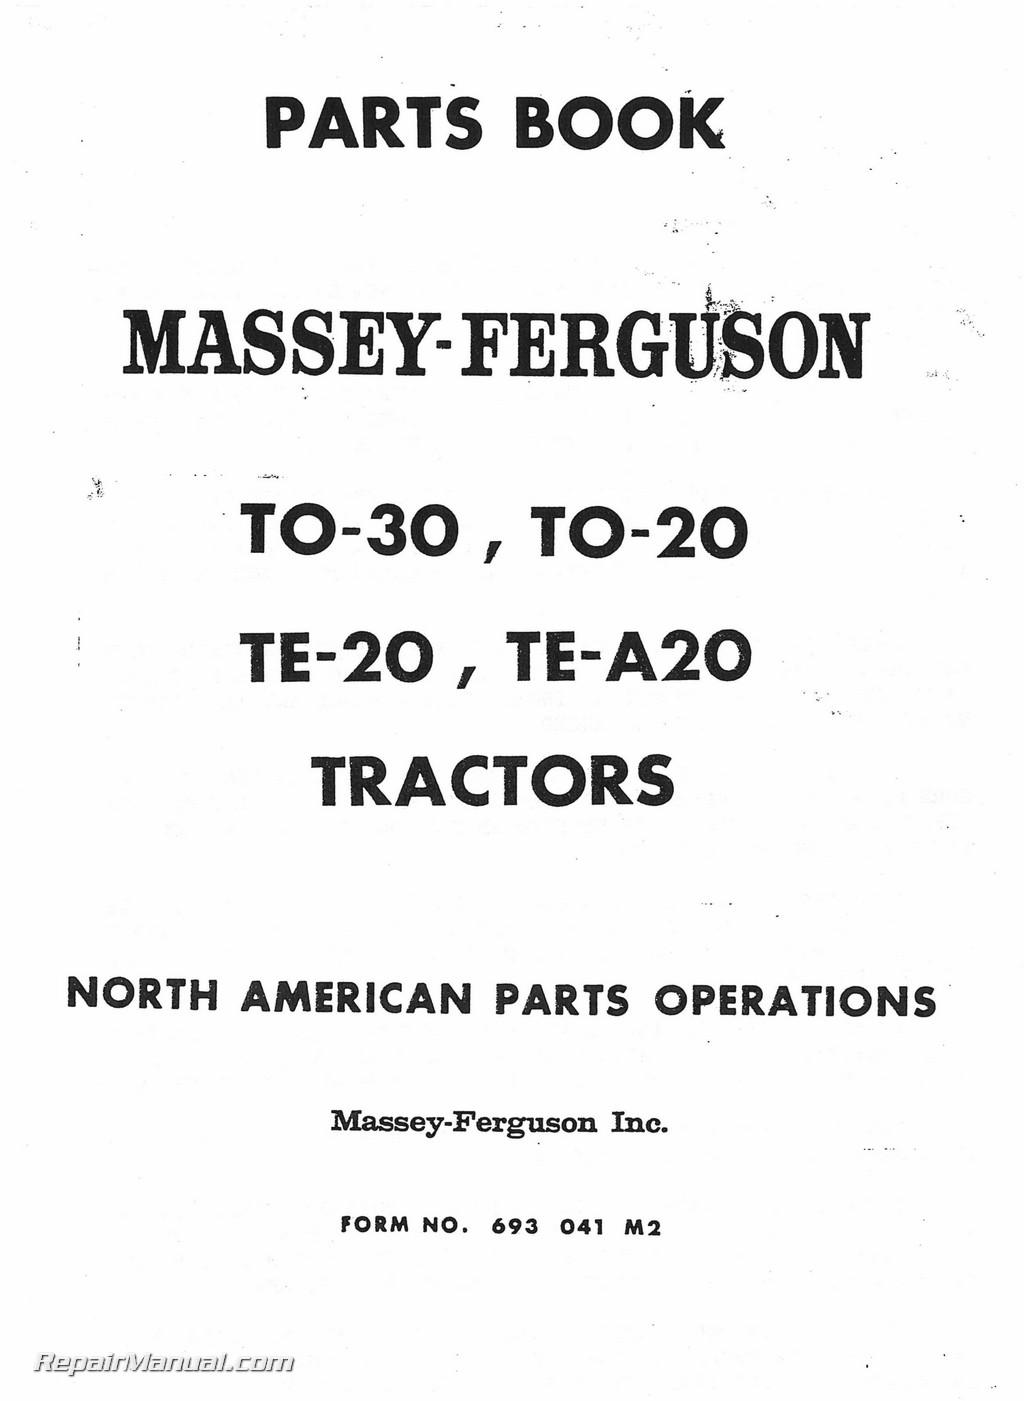 Massey-Ferguson TO-30 TO-20 TE-20 TEA-20 Parts Manual